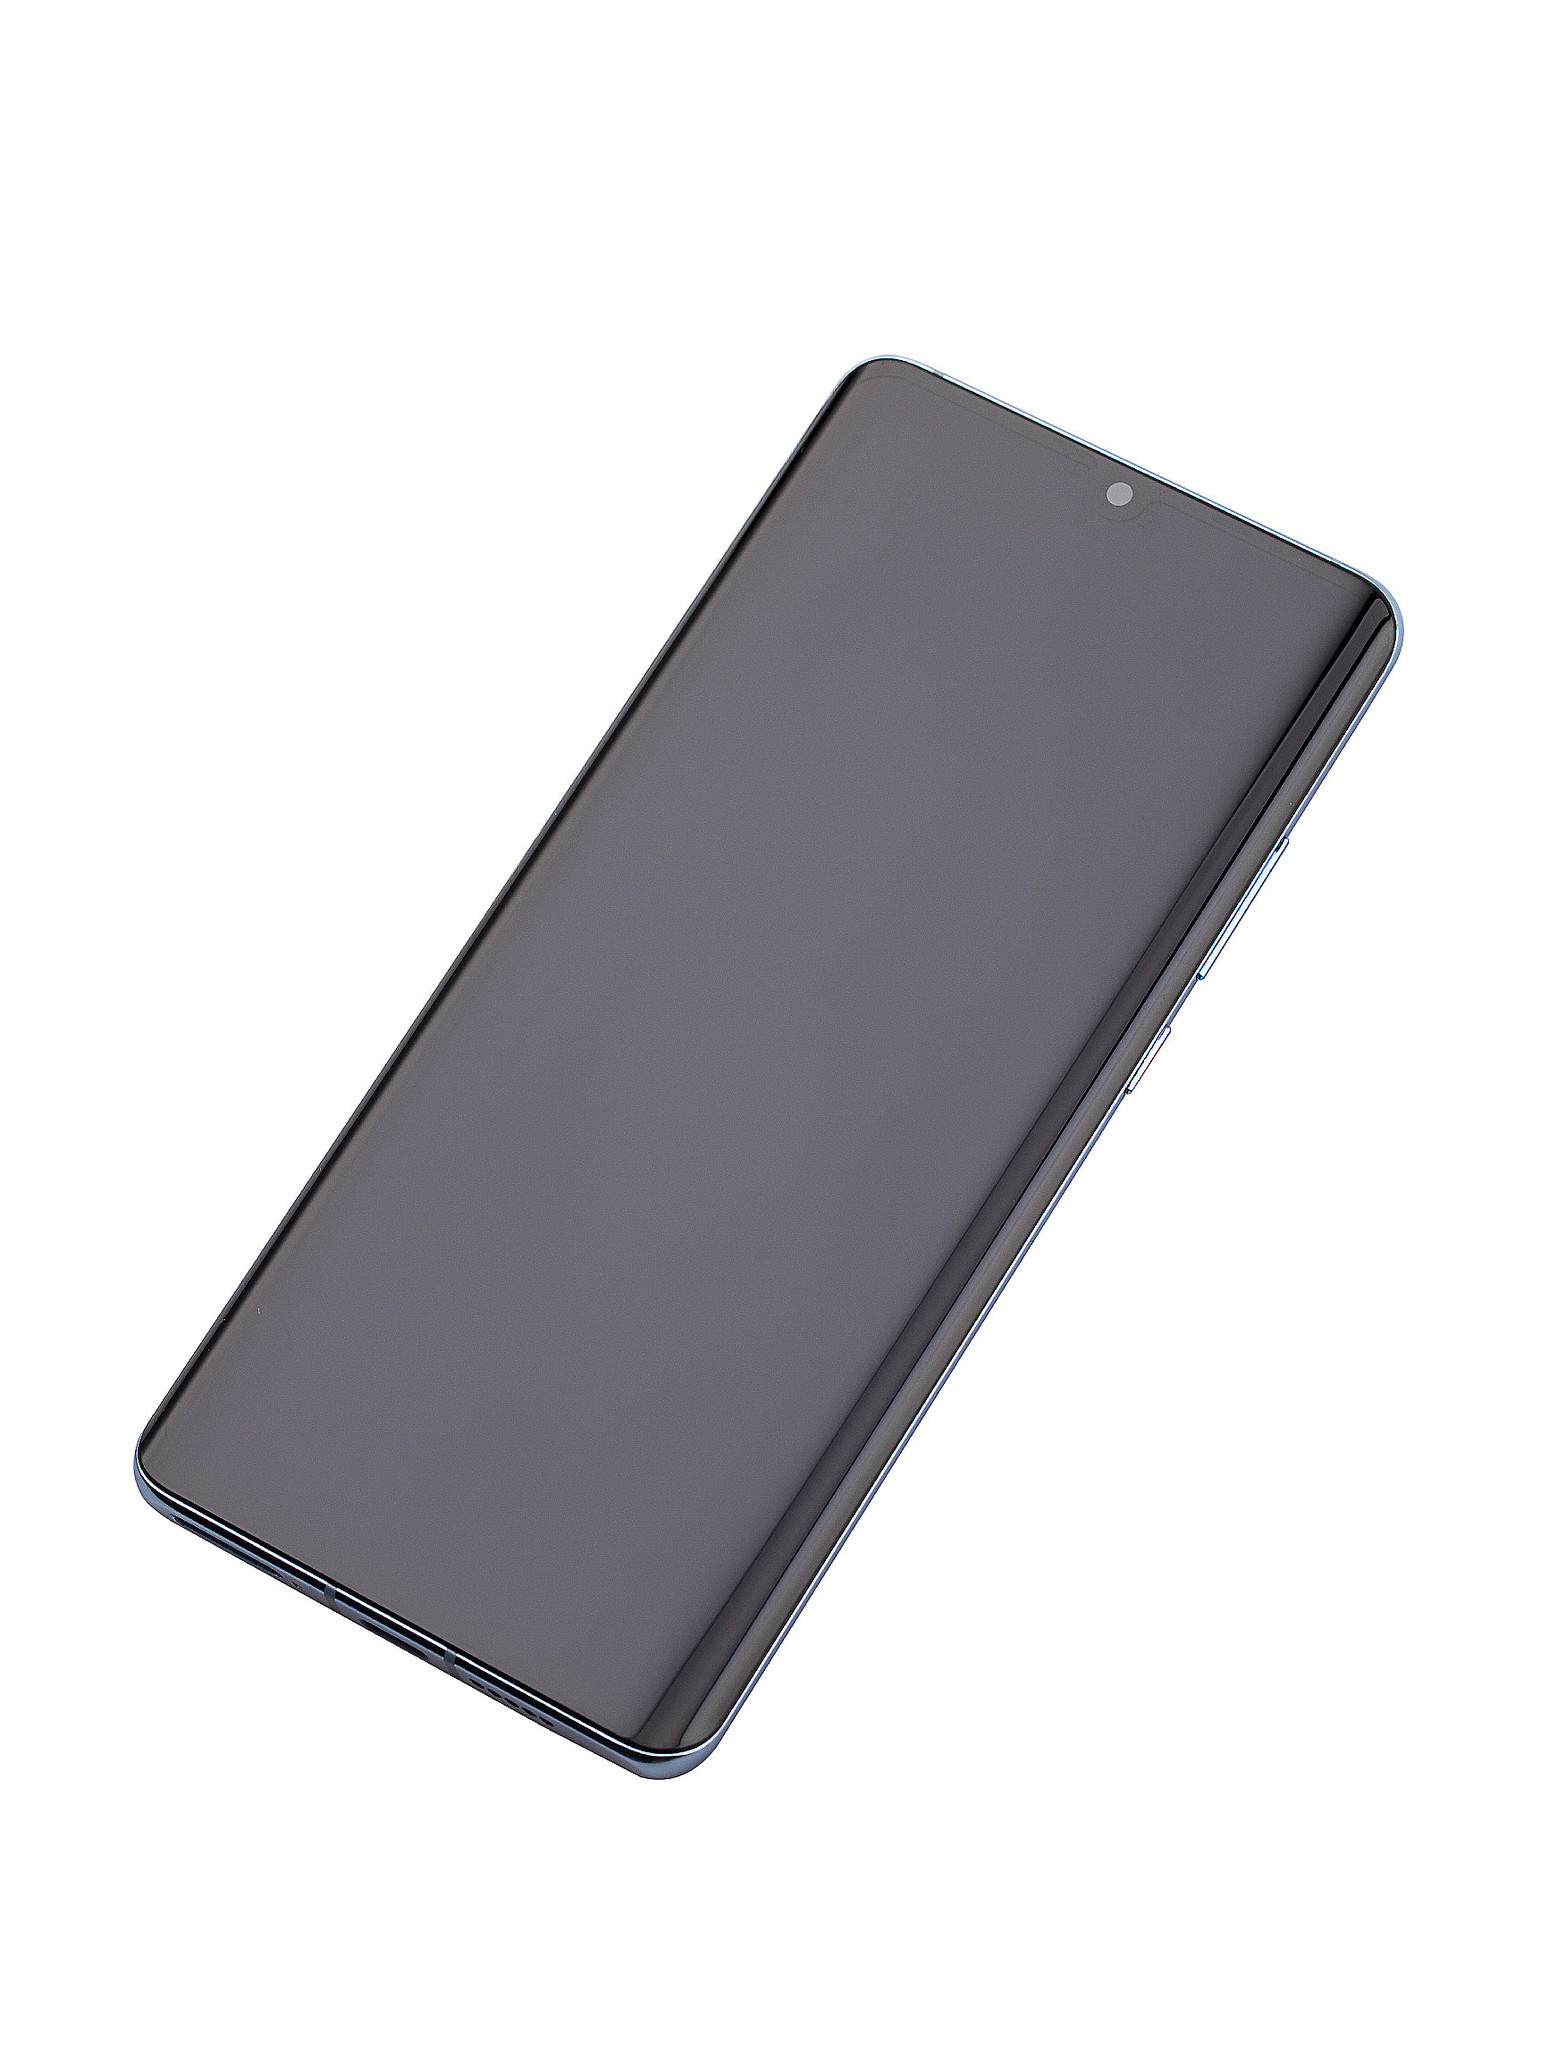 Huawei P30 Pro VOG-L29 Display Module + Frame Crystal